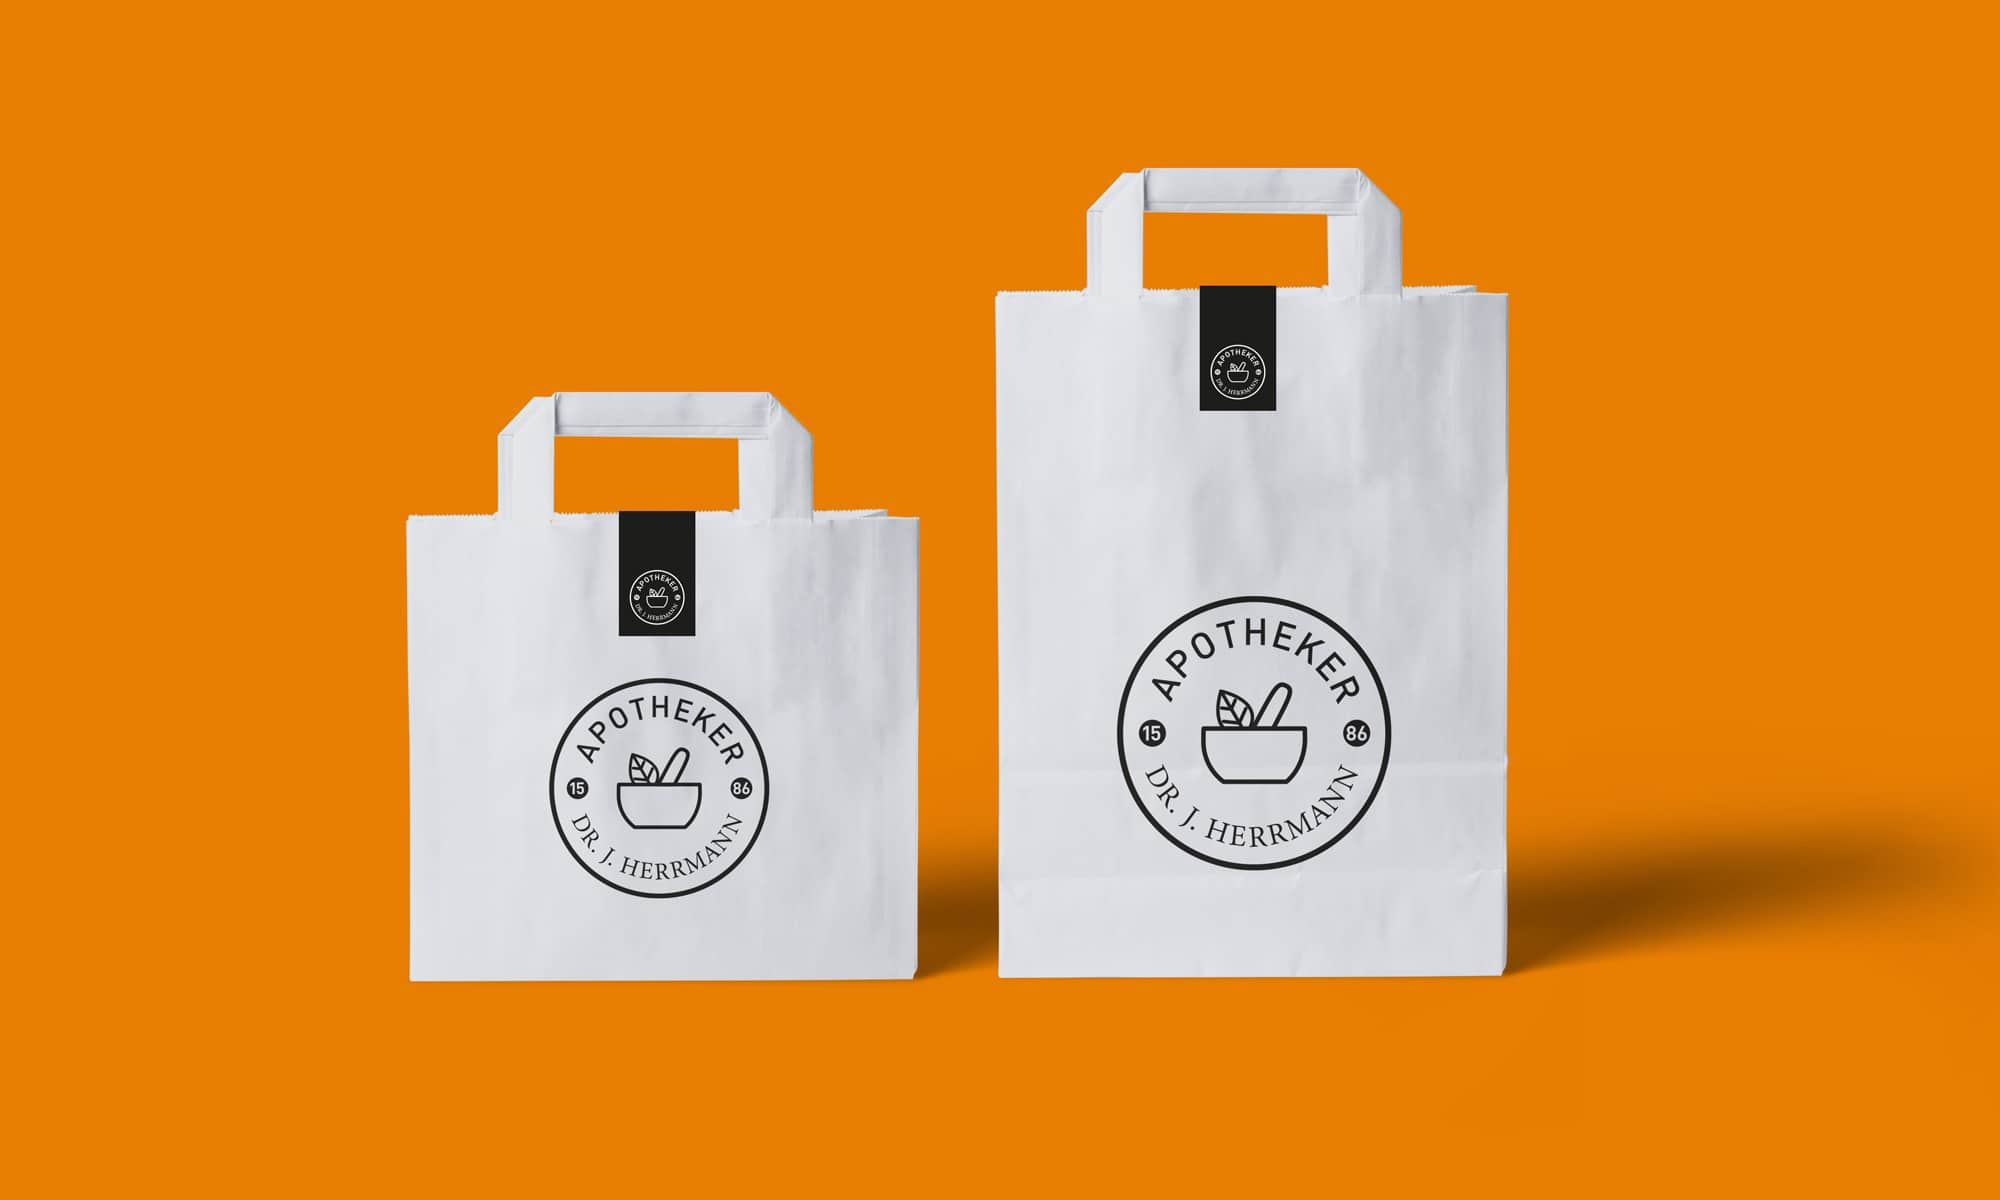 plan-x-Corporate-Design-Paper-Bag-Apotheke